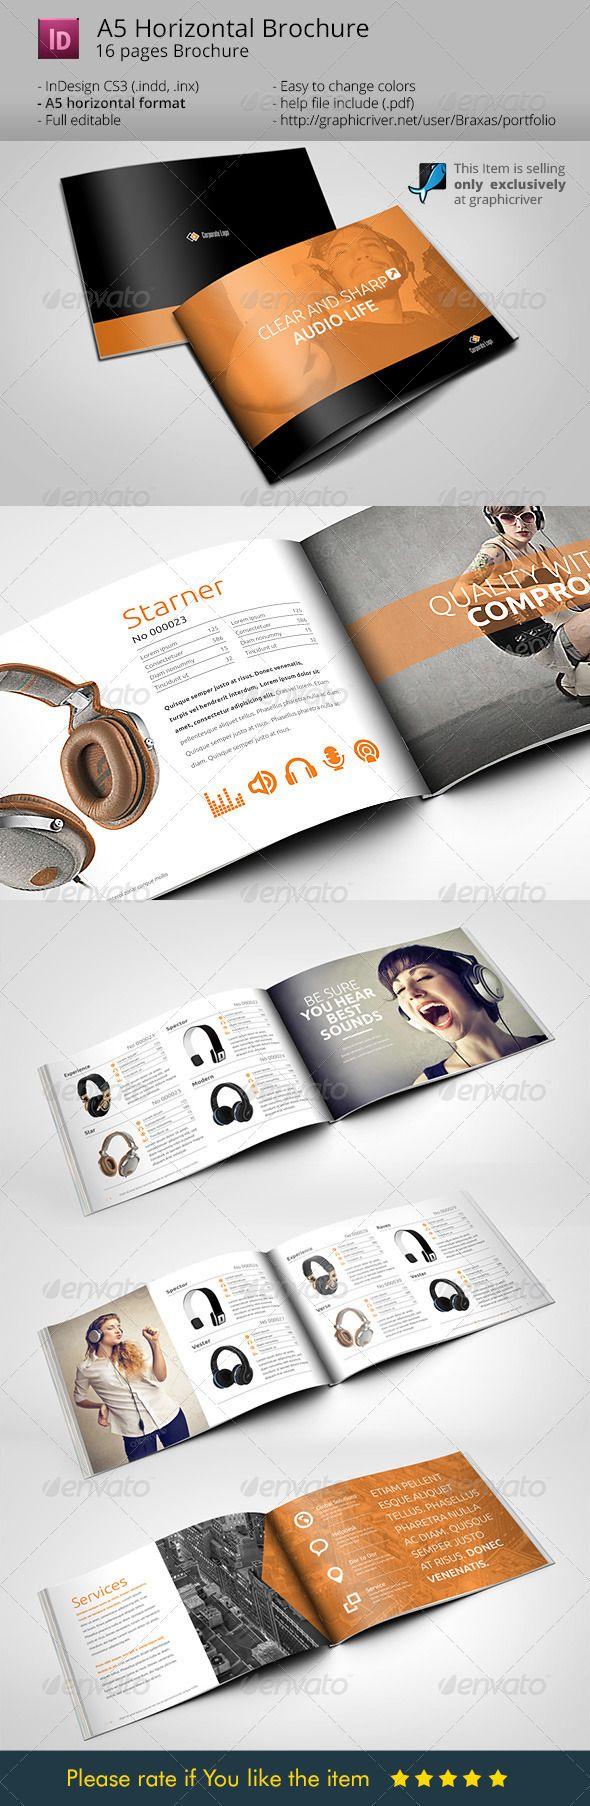 Horizontal Brochure A5 Audio Life  — InDesign Template #catalogue #braxas • Download ➝ https://graphicriver.net/item/horizontal-brochure-a5-audio-life/7818468?ref=pxcr